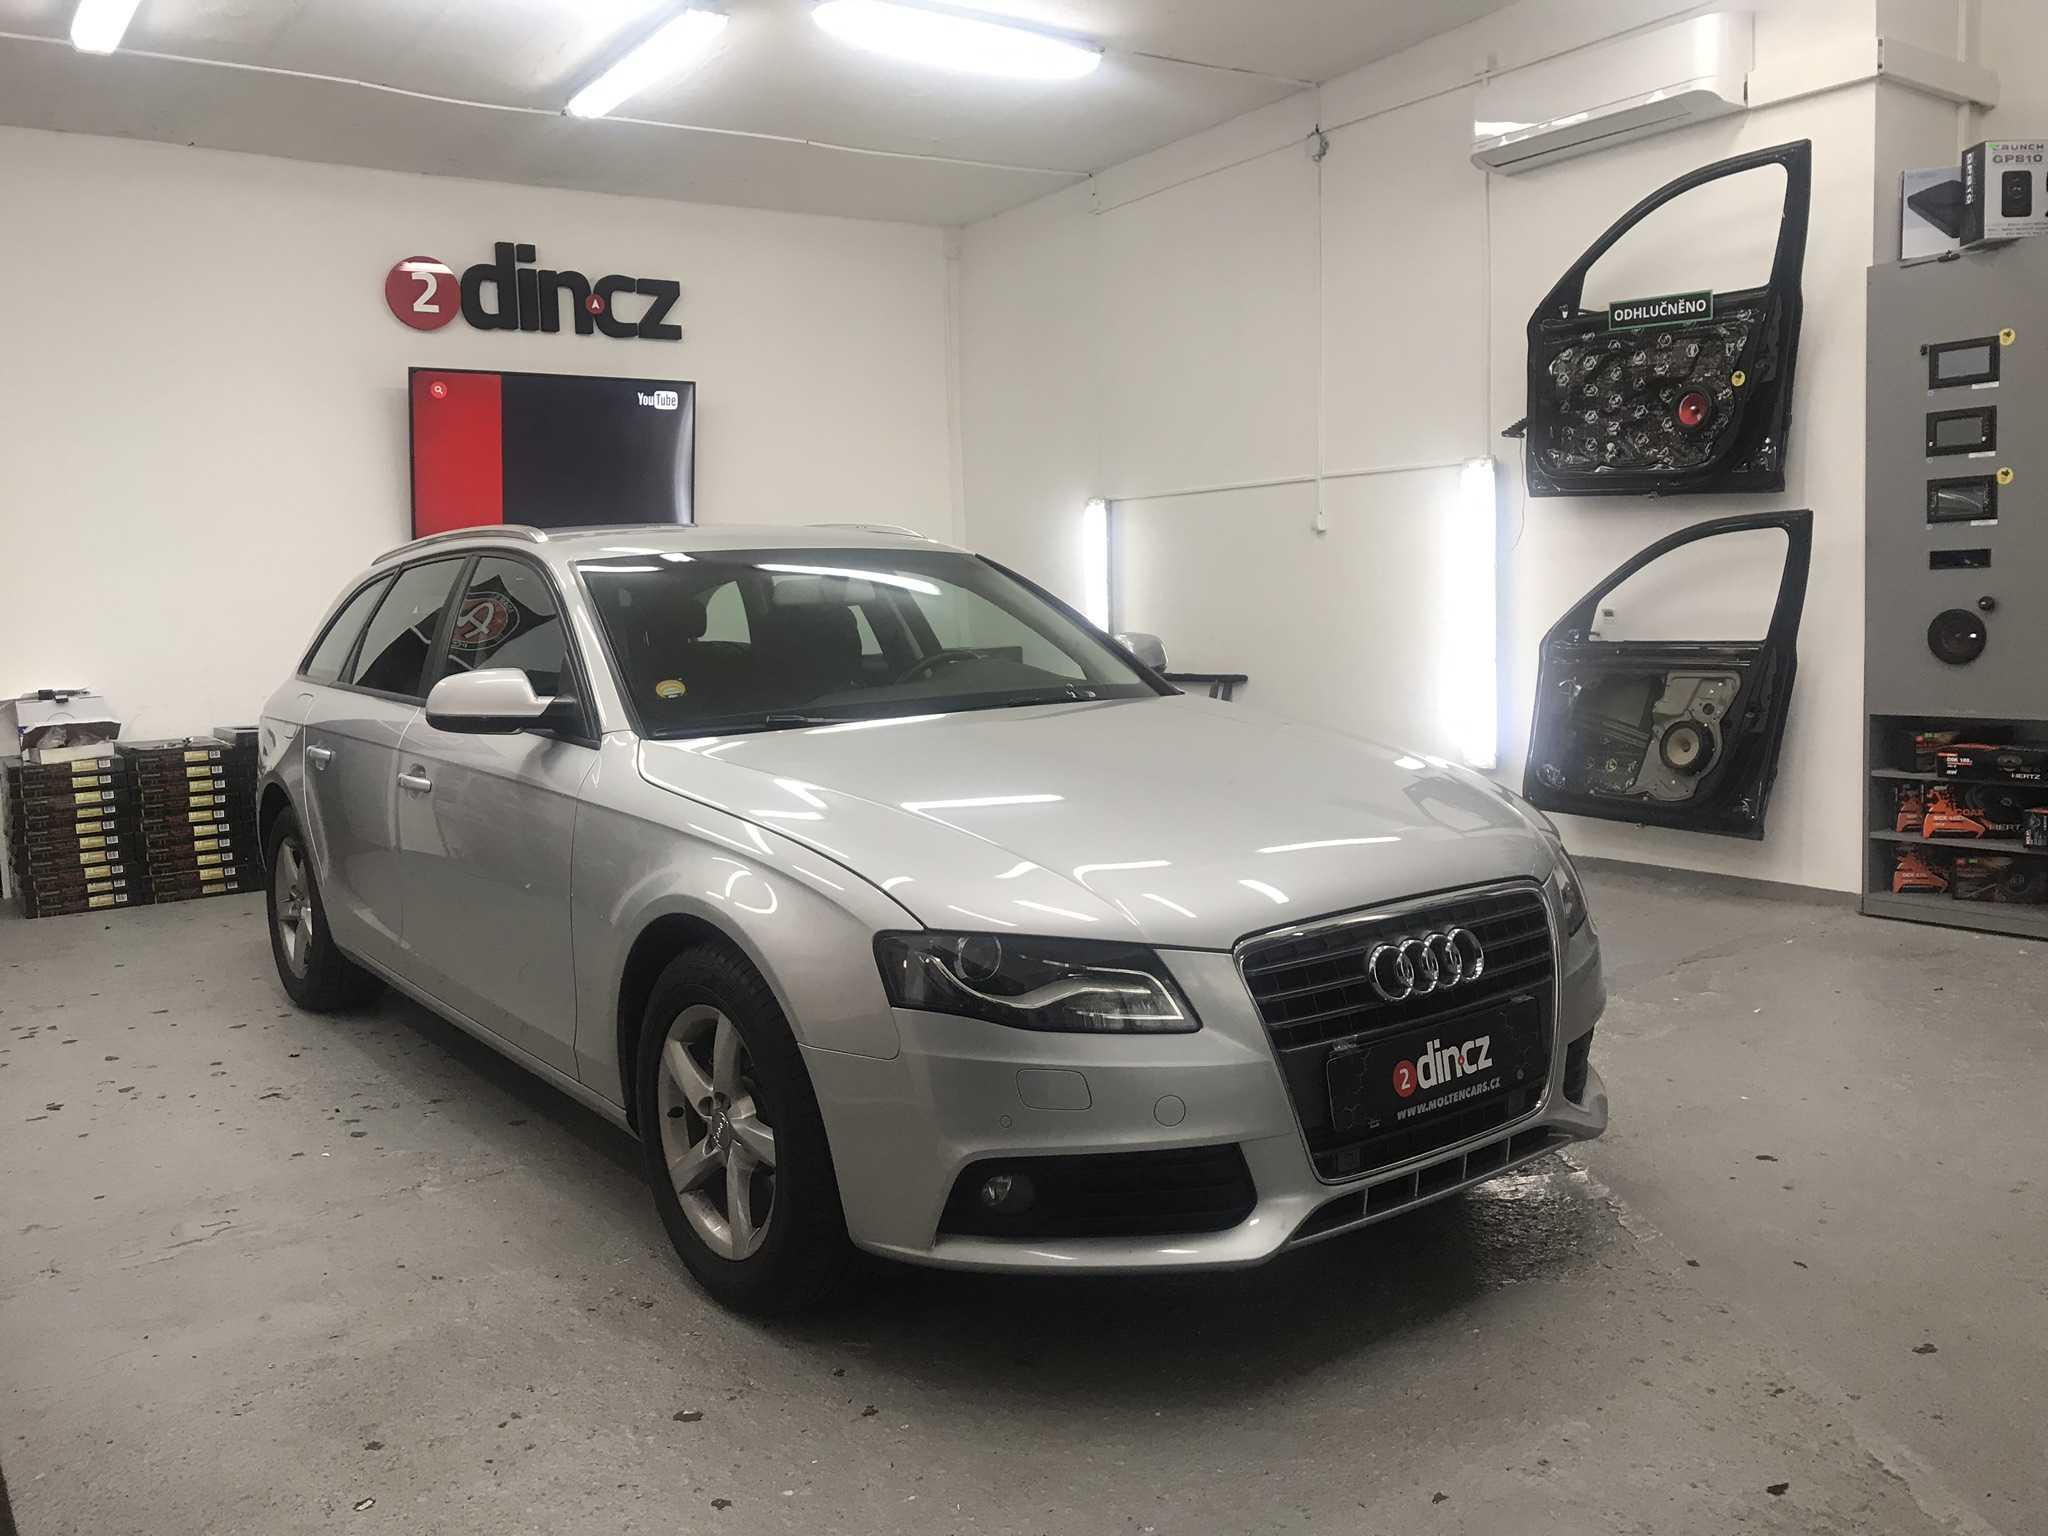 Audi A4 B7 - Instalace reproduktorů a vytlumení